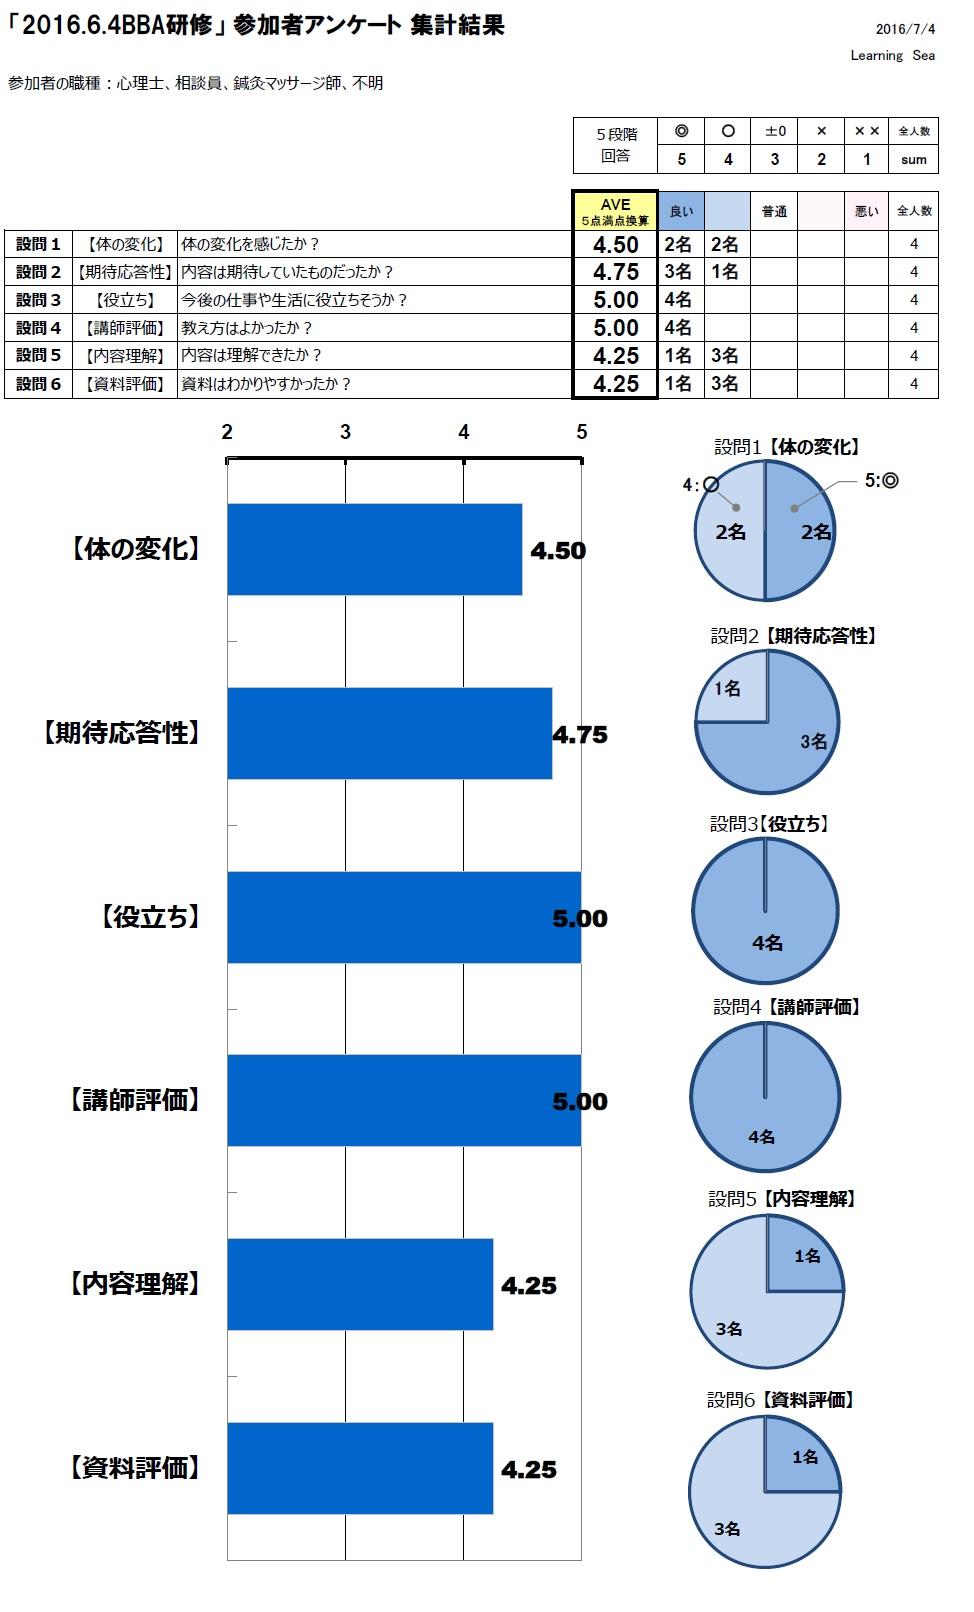 4.1 20160604 BBAアンケート結果数値化まとめ